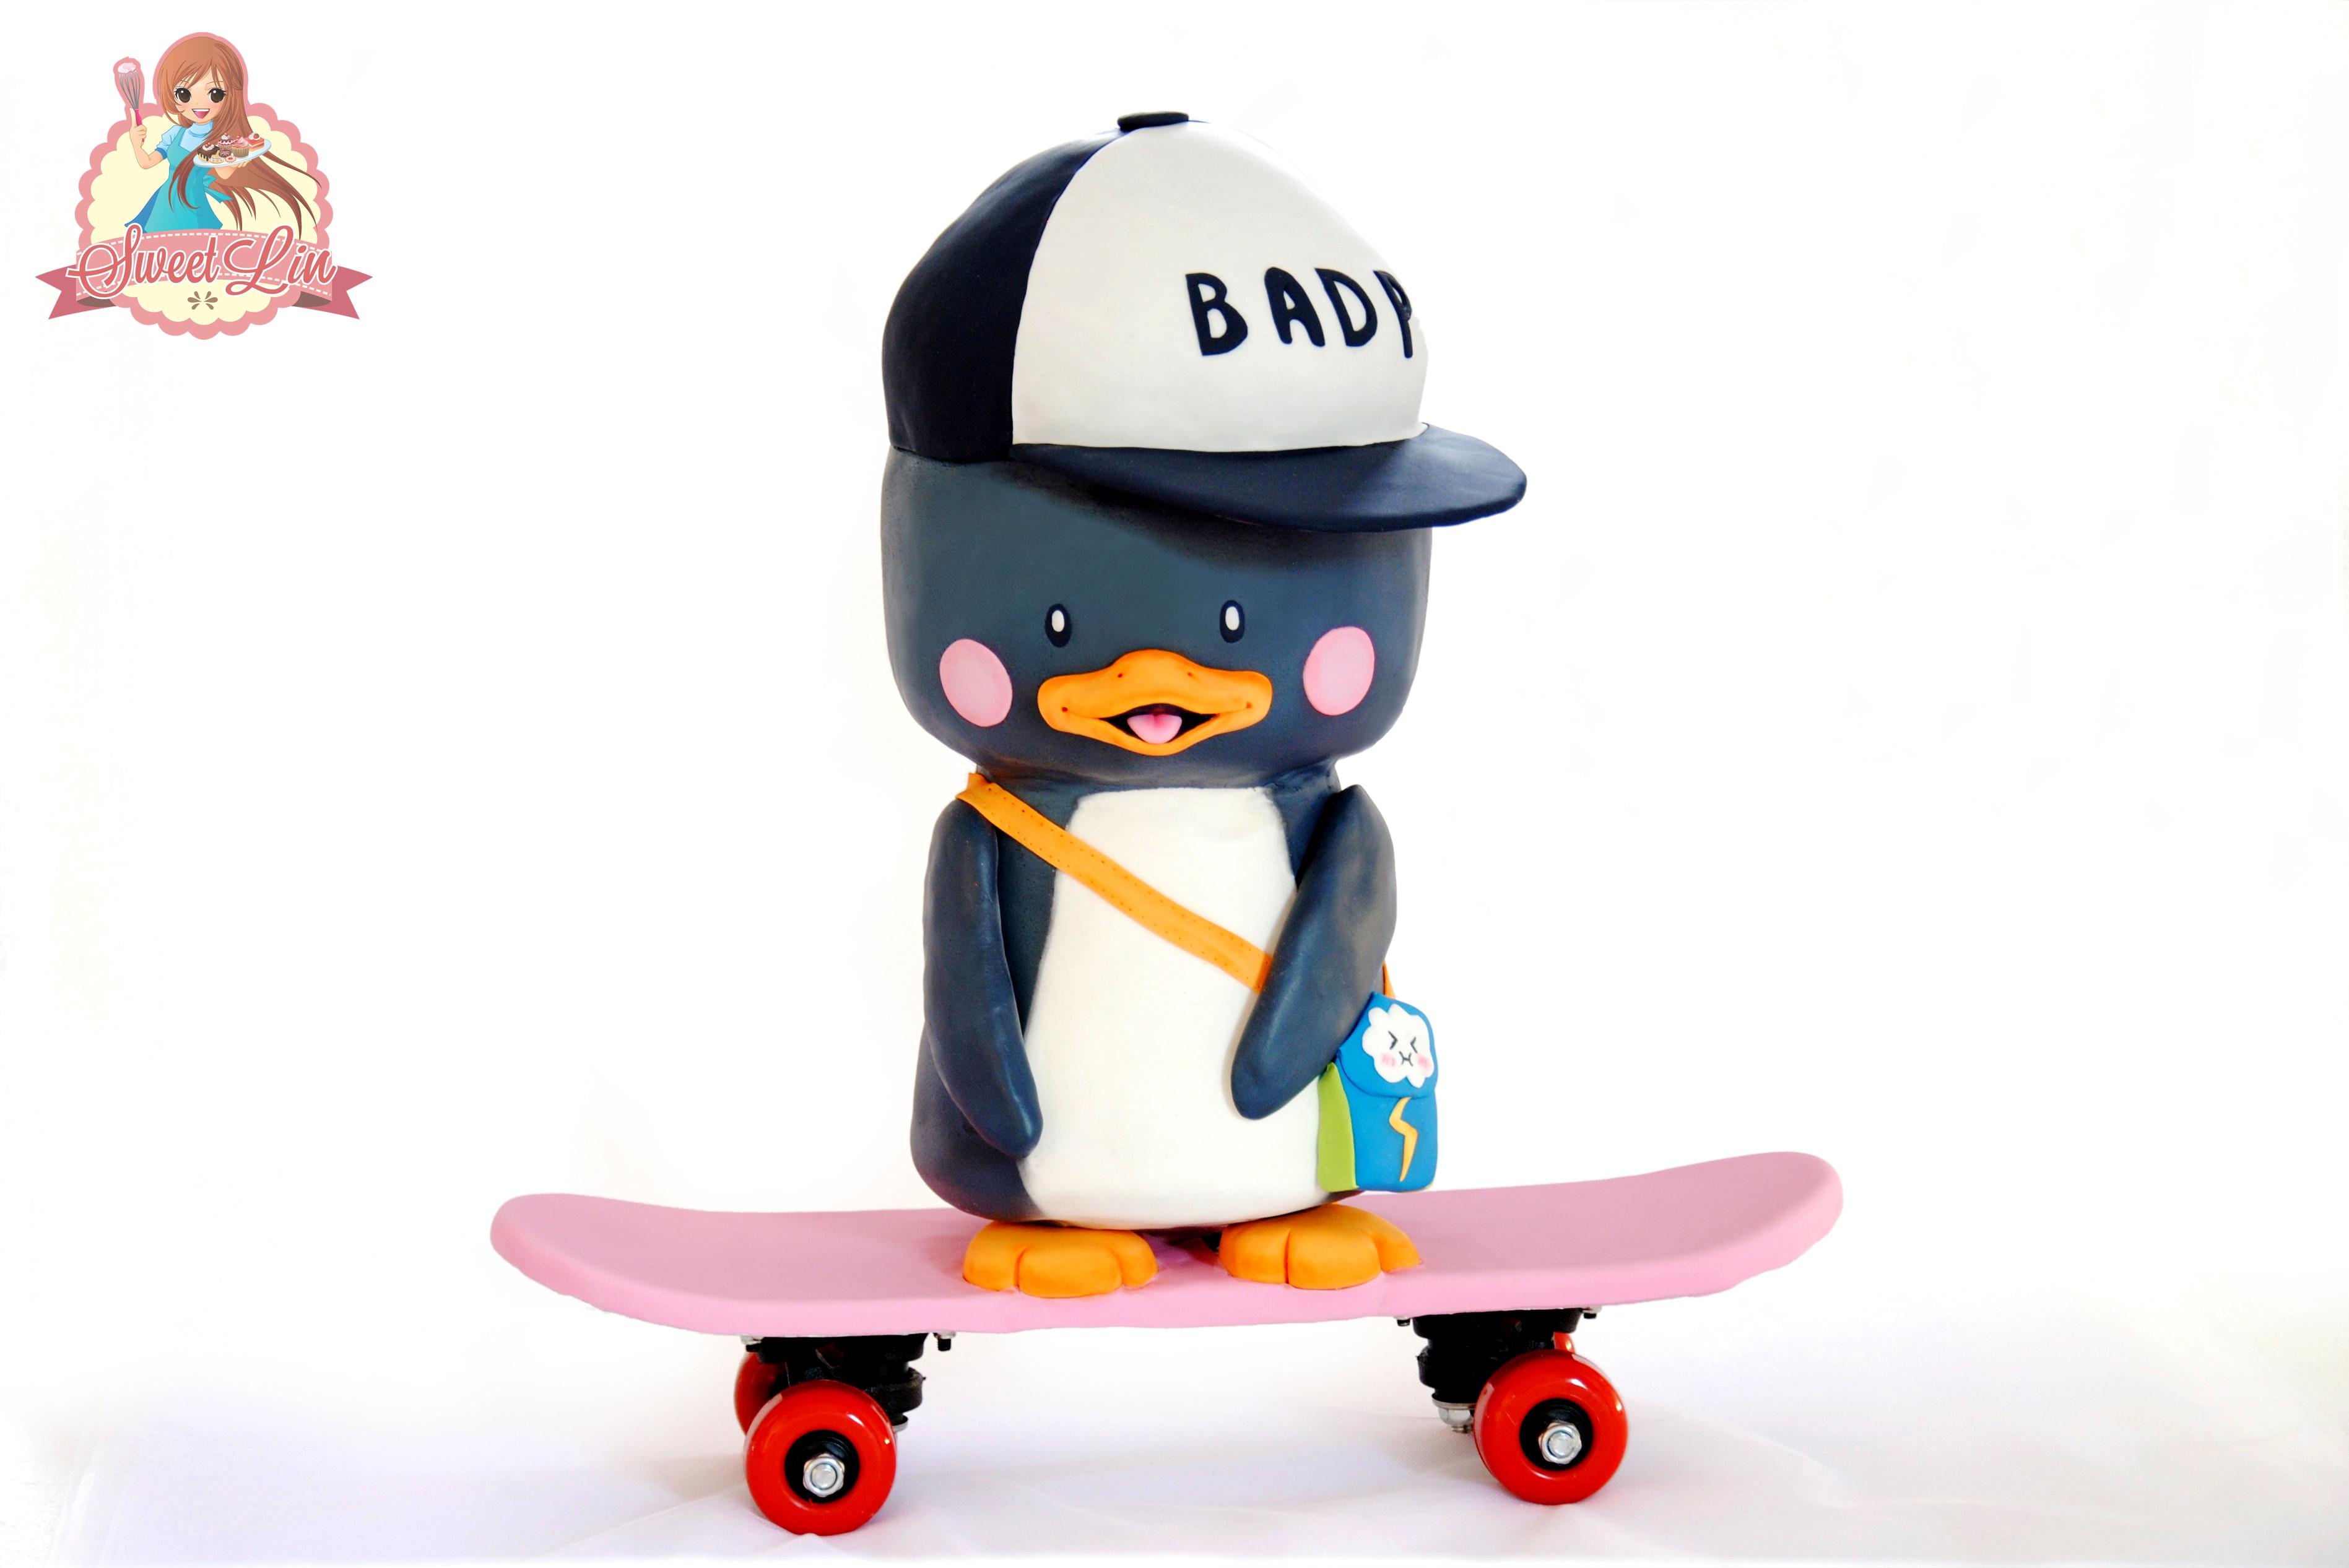 Sculpted Penguin on a Skateboard